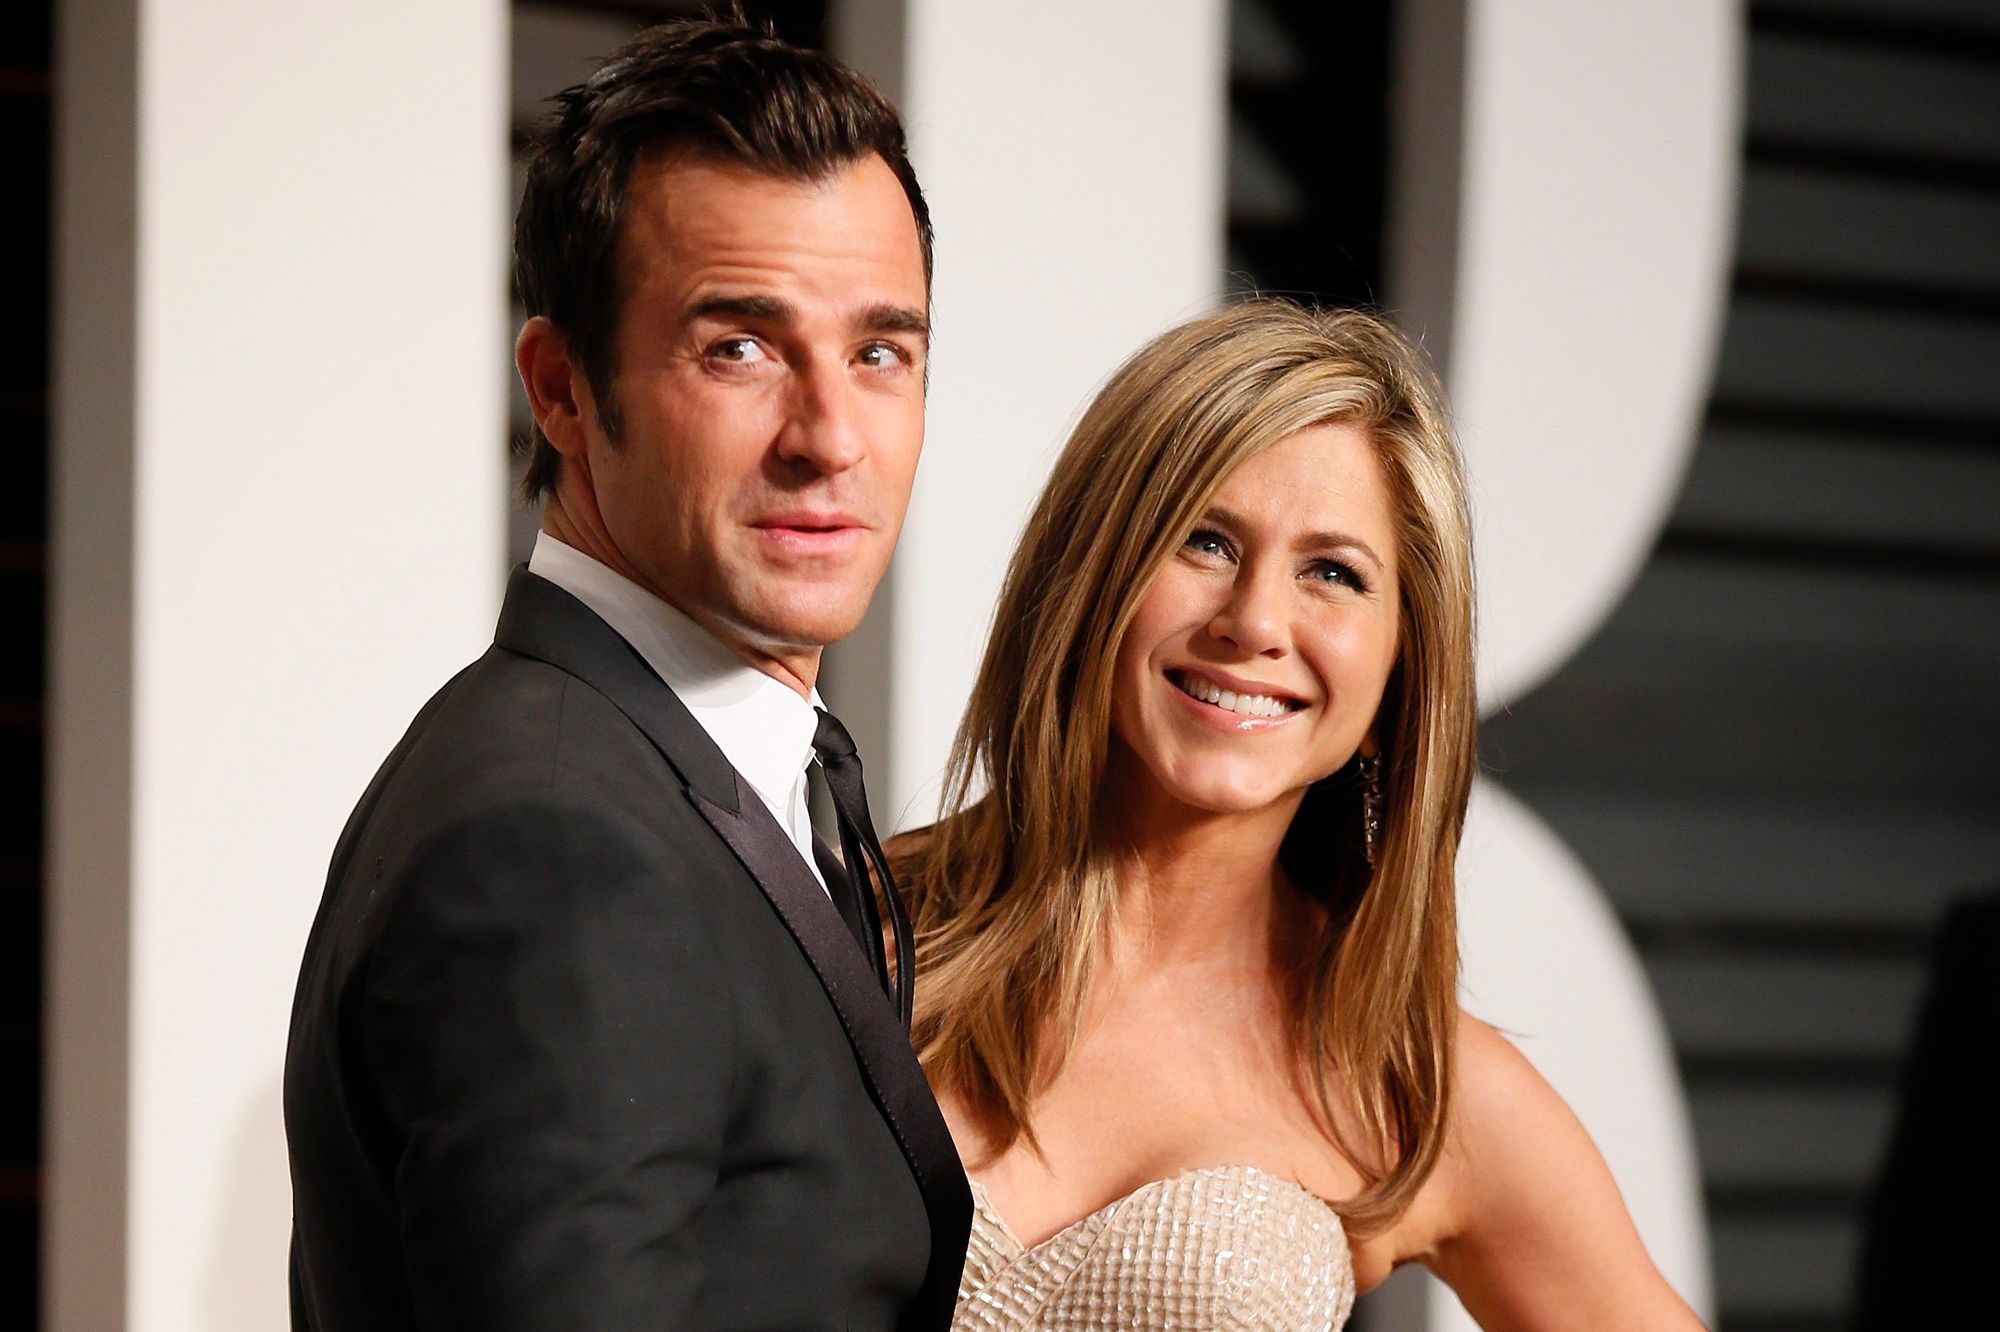 les anecdotes croustillantes dhoward stern mariage de jennifer aniston et justin theroux - Jennifer Aniston Mariage